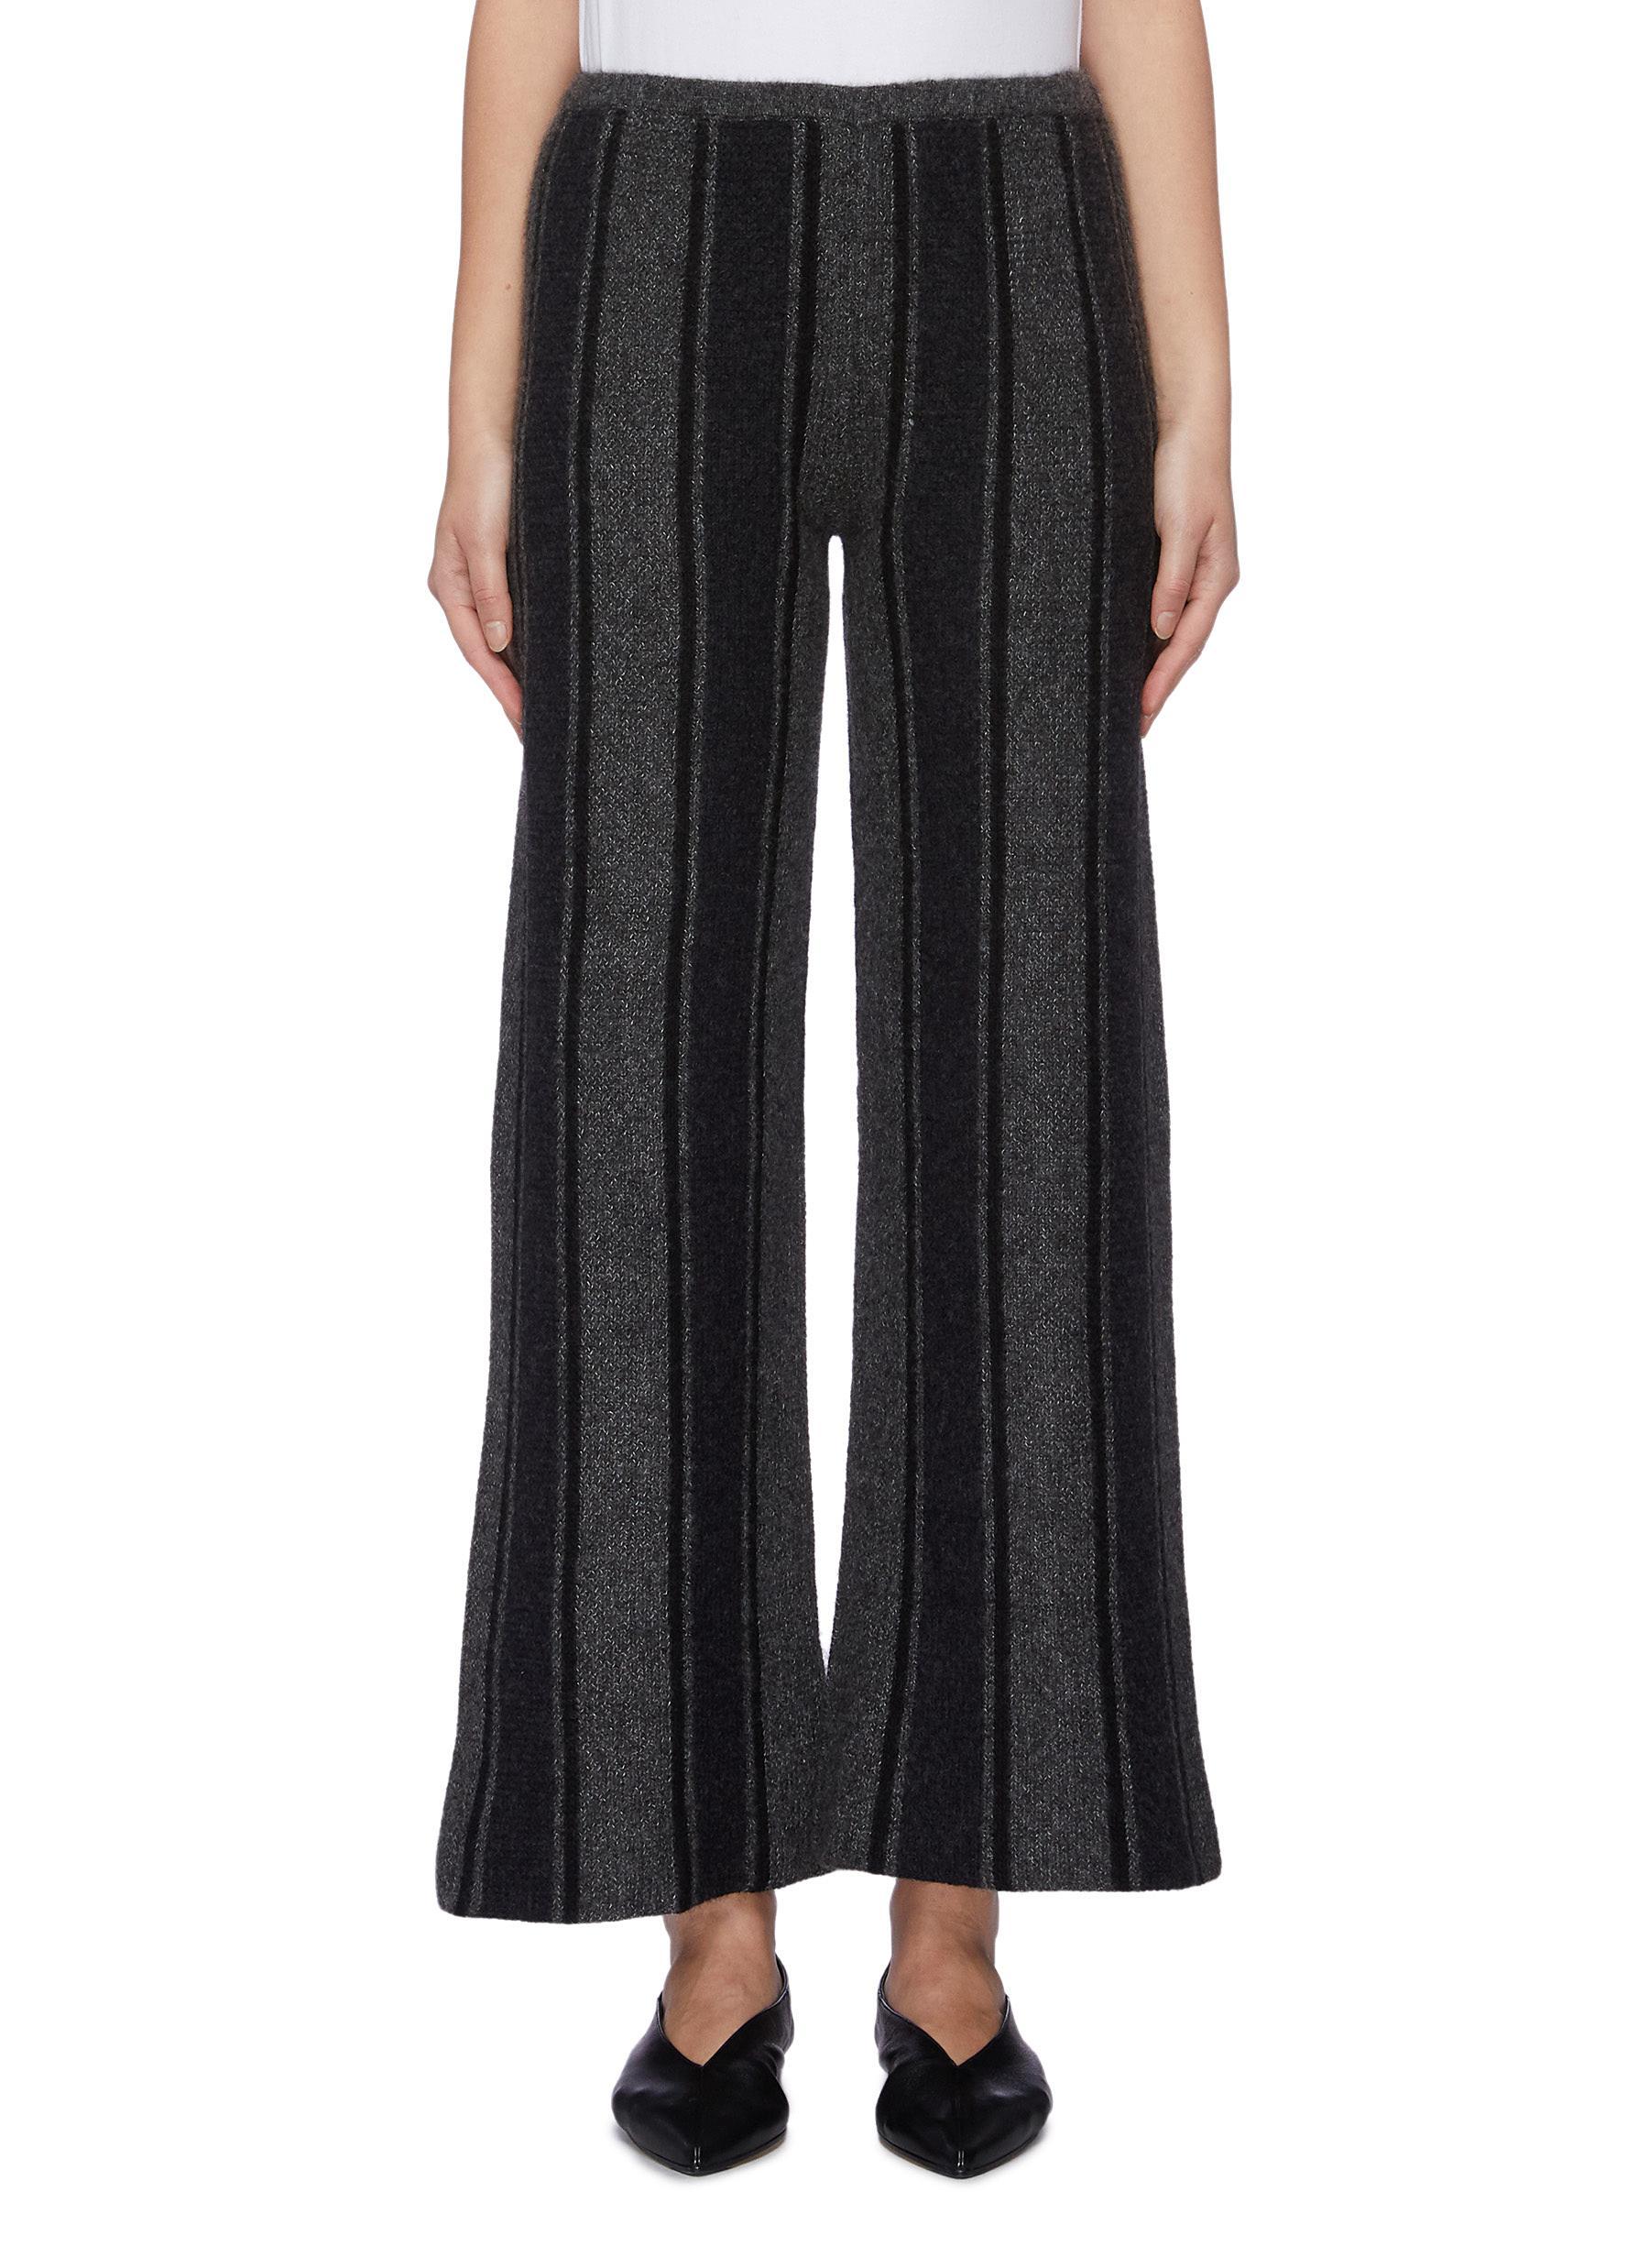 Culotta stripe cashmere-silk knit wide leg pants by The Row